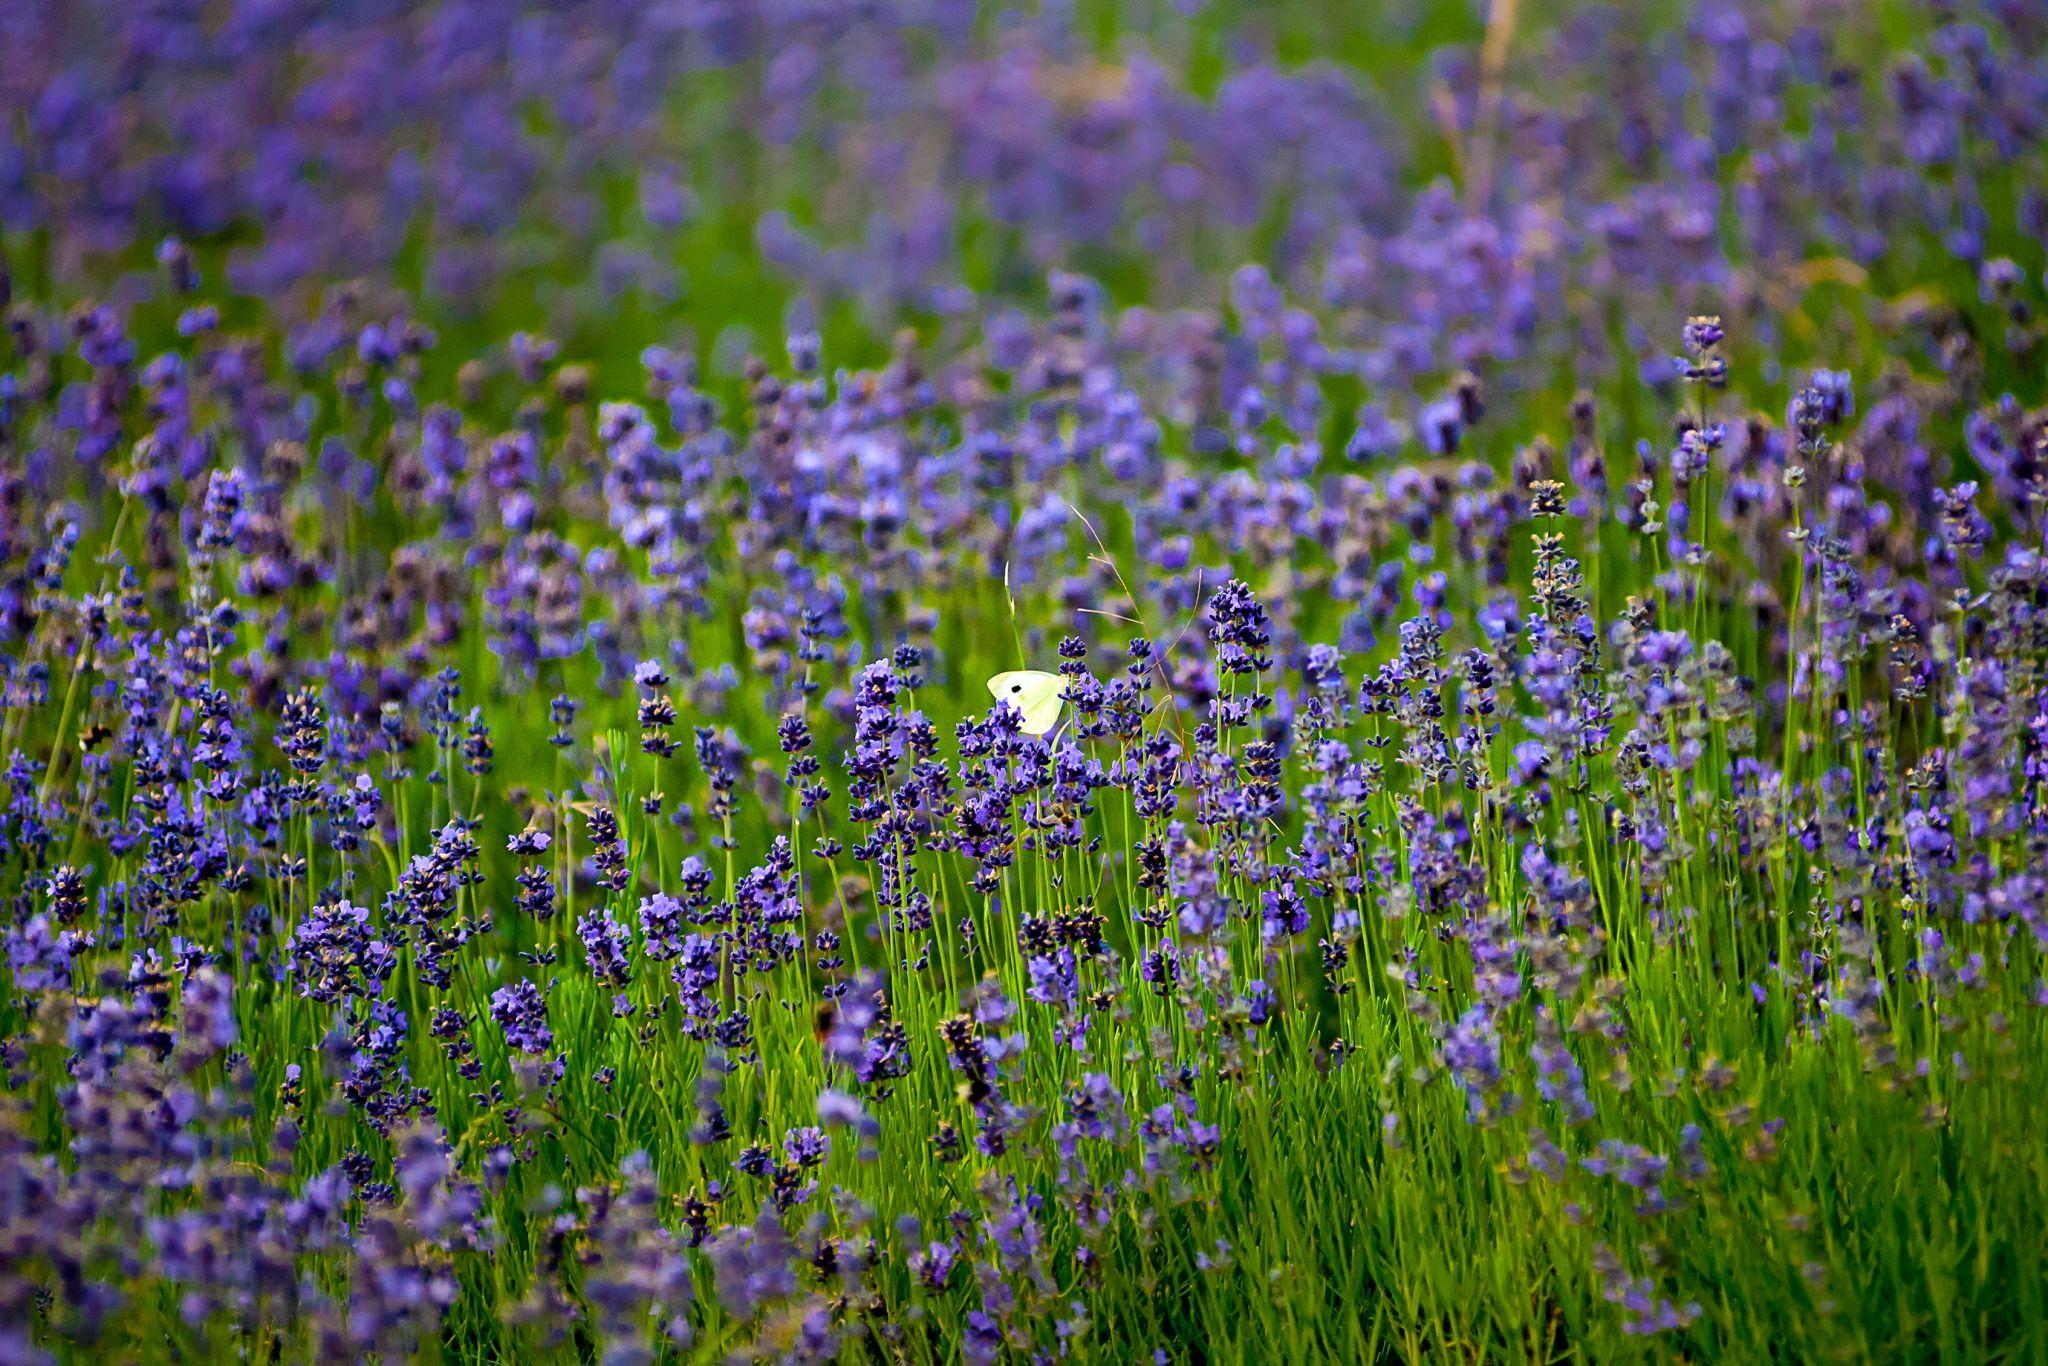 Lavendelfelder, Germany